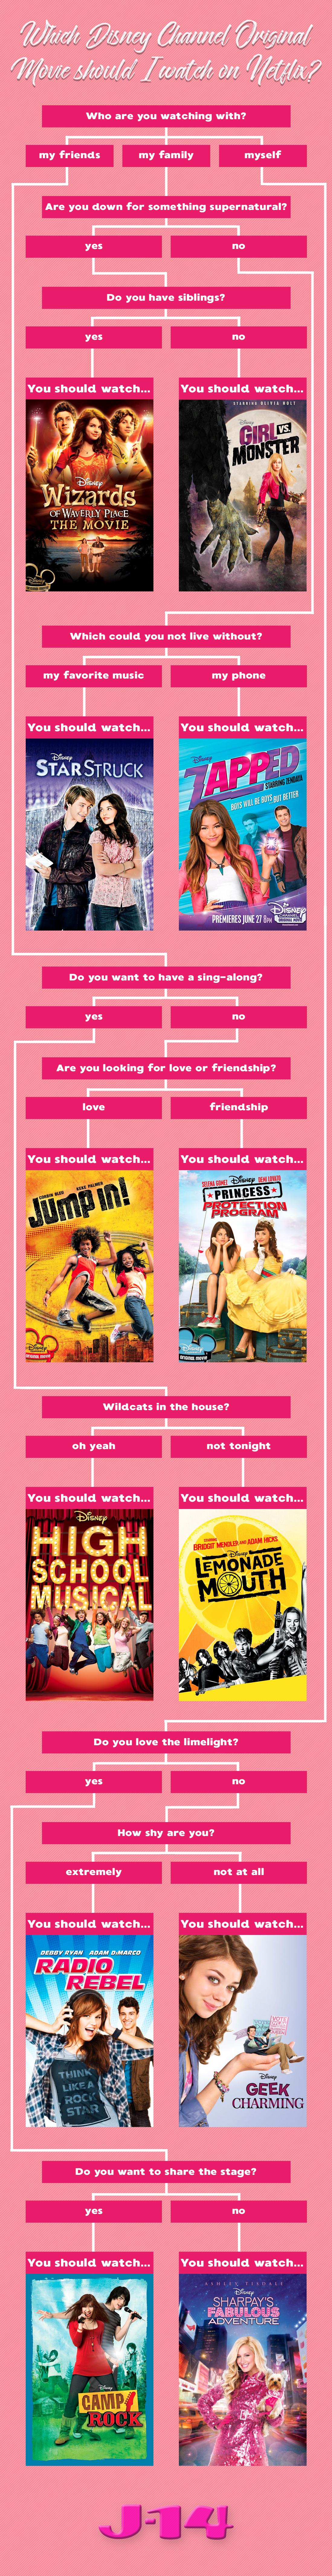 which dcom on netflix should i watch?